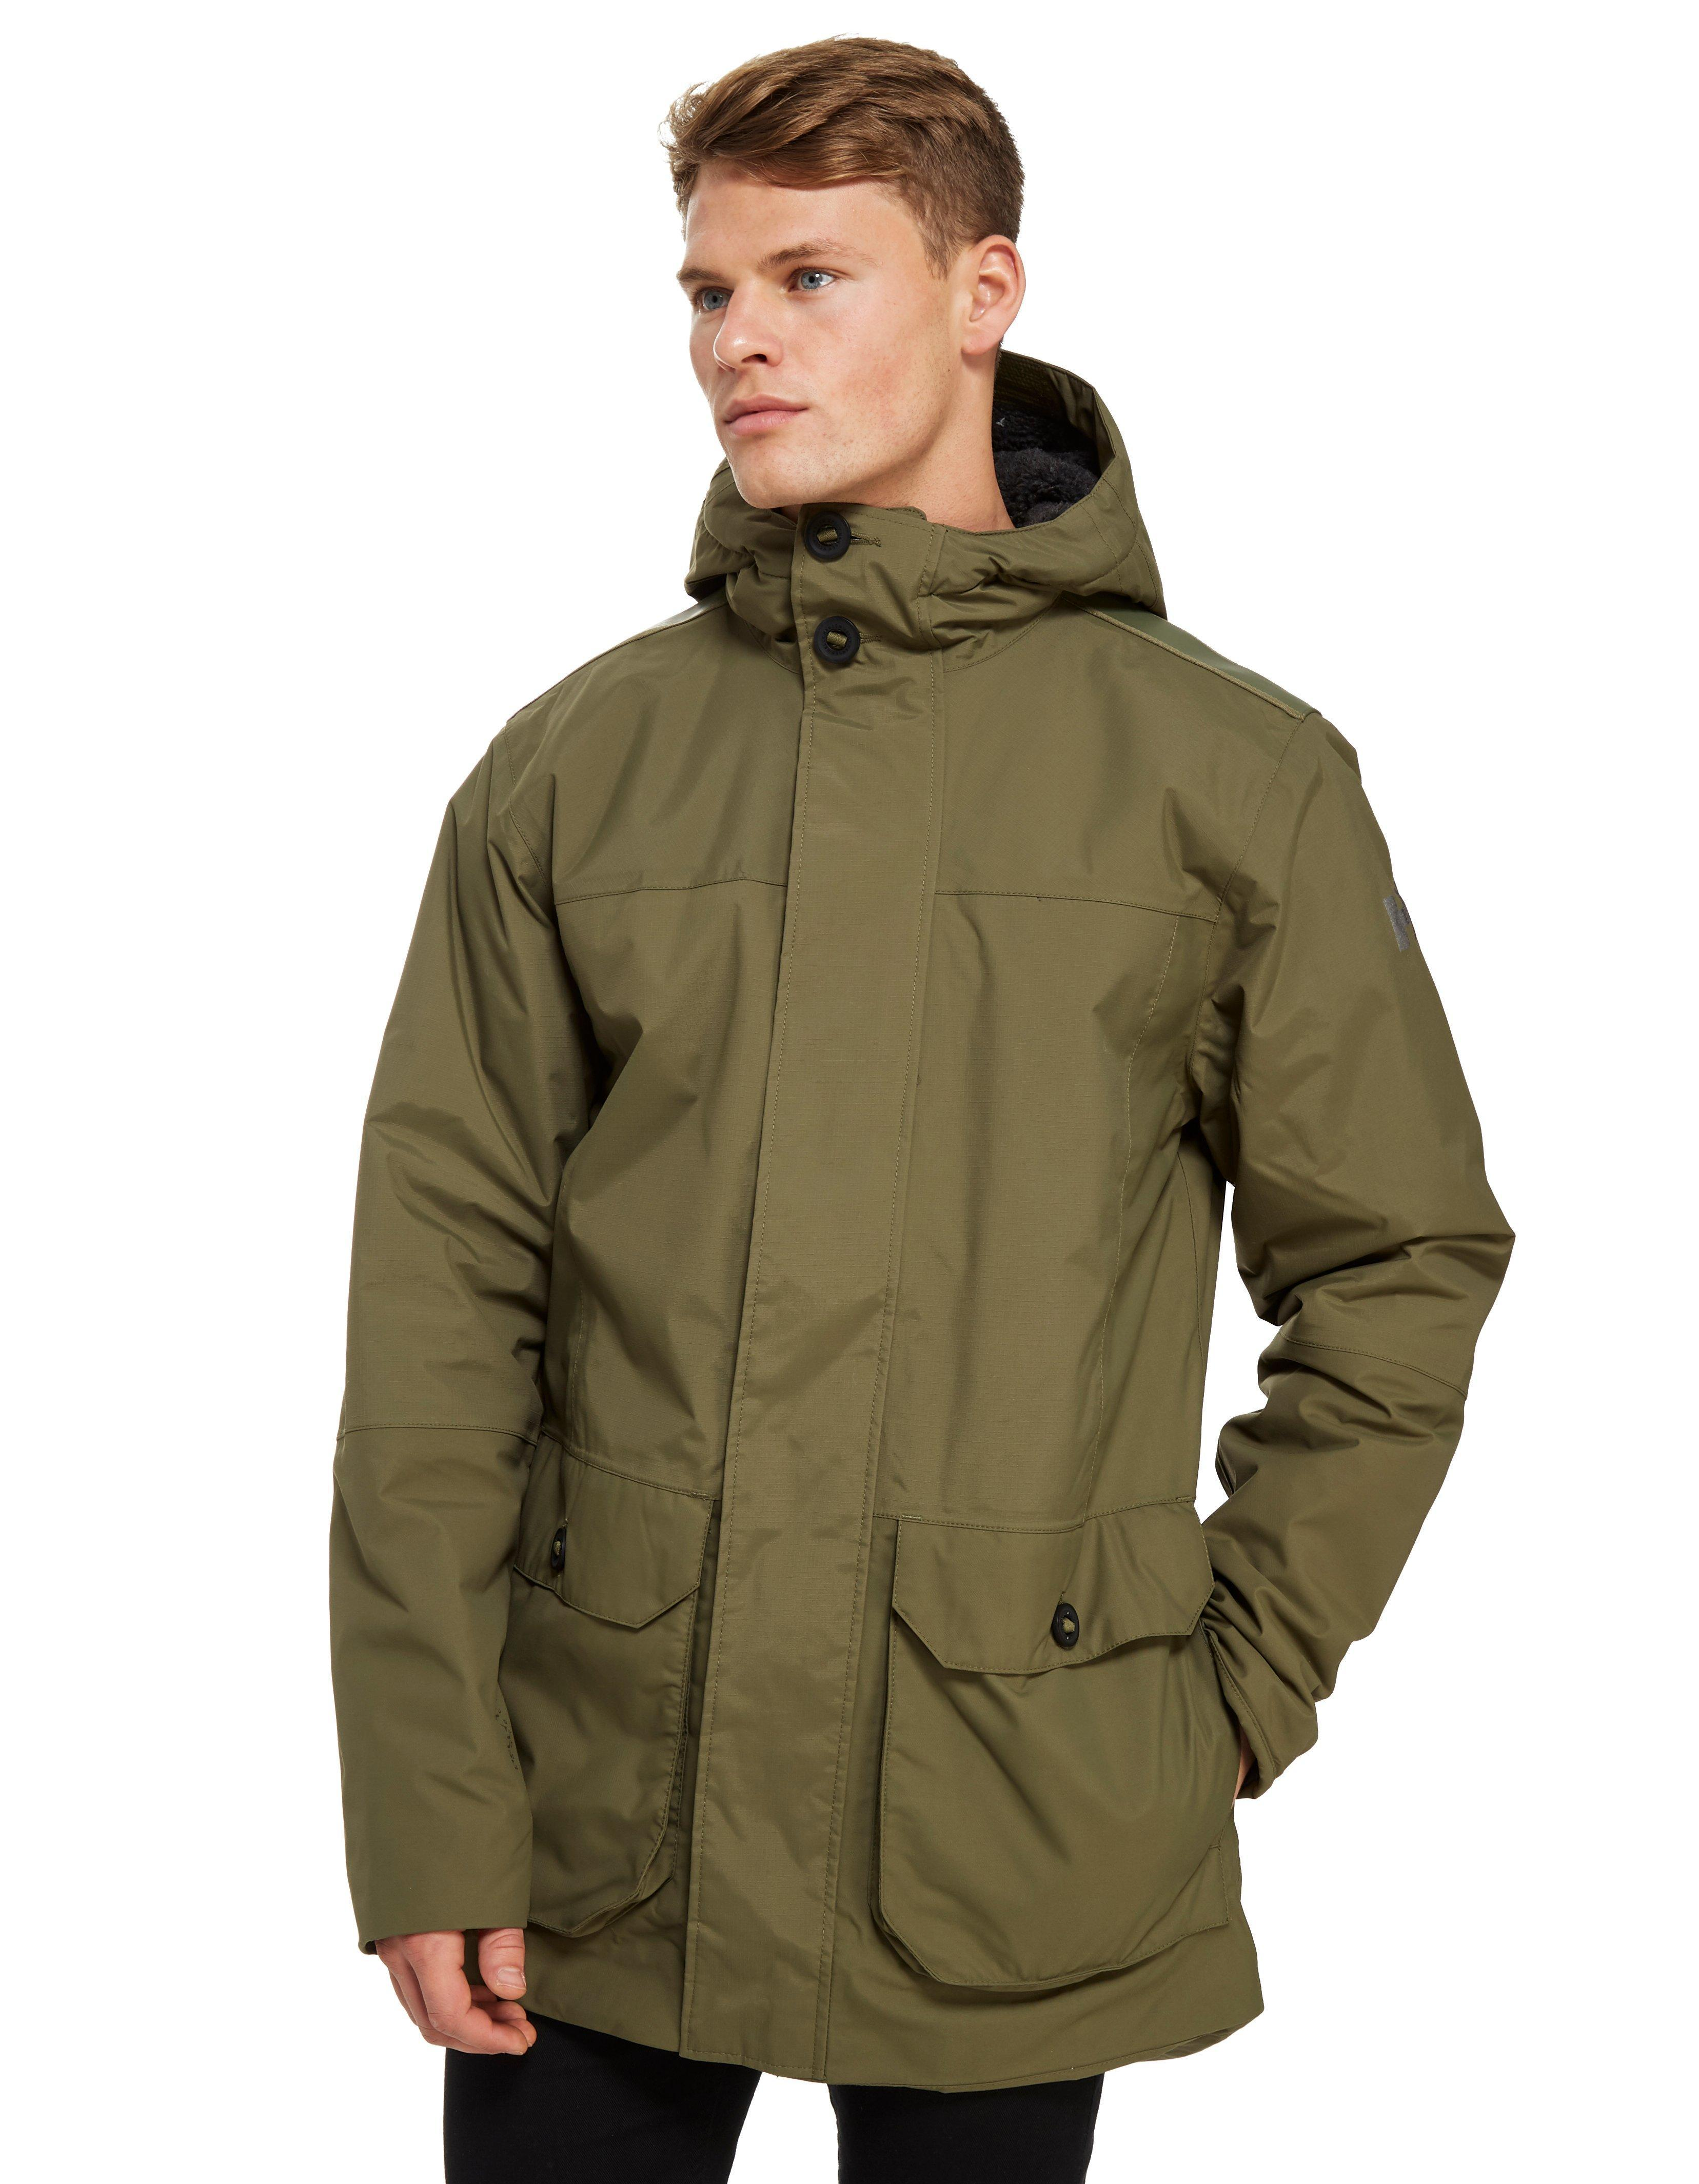 Helly Hansen Waterproof Killarney Parka Jacket